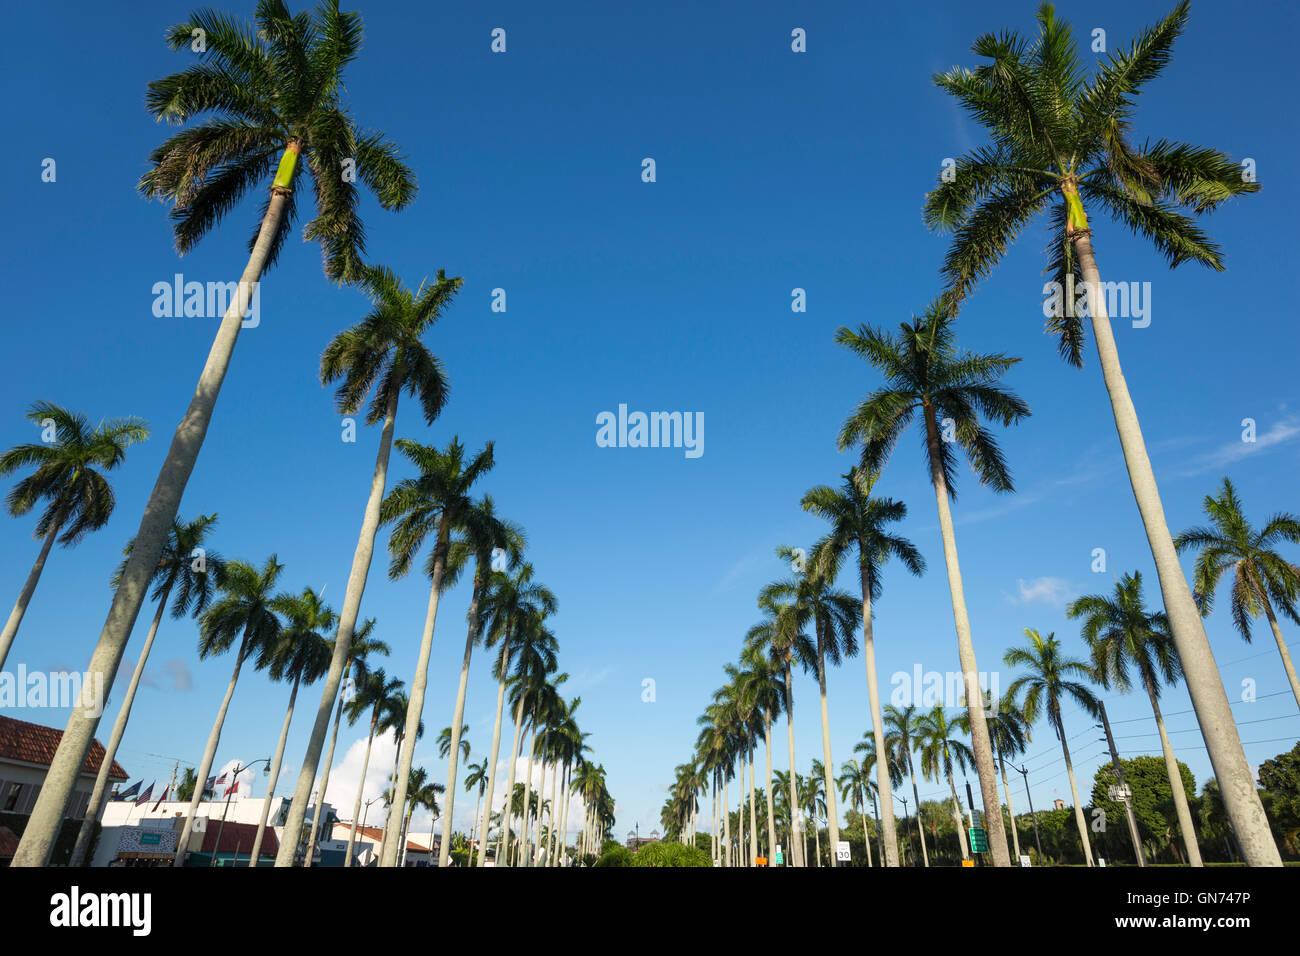 LINES OF TALL PALM TREES ROYAL POINCIANA WAY PALM BEACH FLORIDA USA Stock Photo